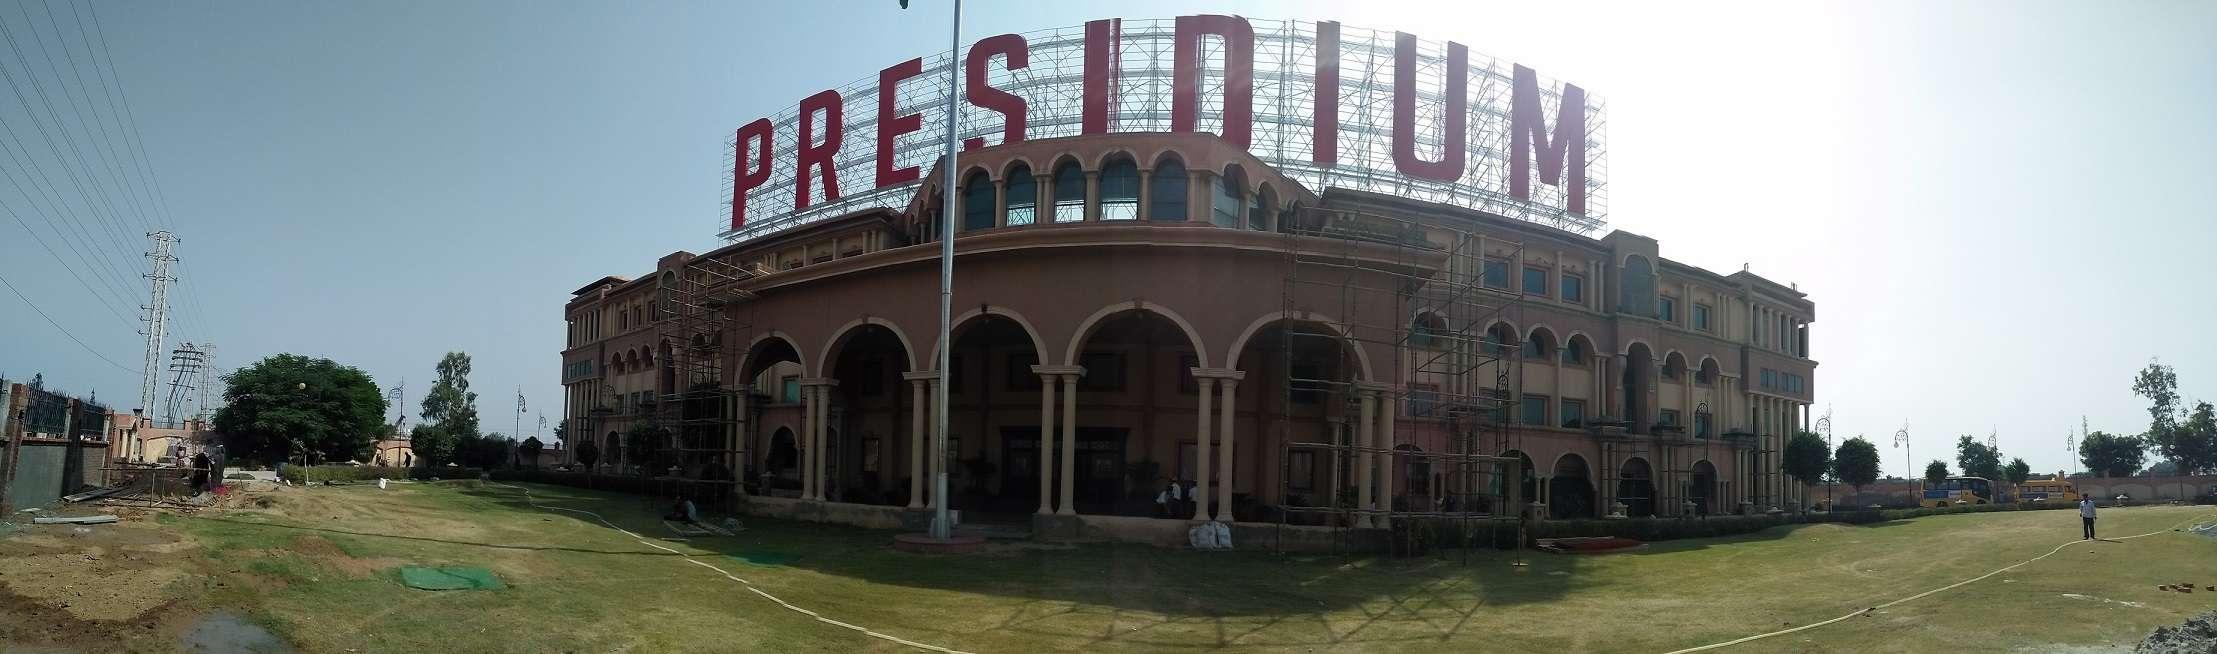 G D GOENKA PUBLIC SCHOOL FARIDABAD 42 5 K M Stone Delhi Mathura Road N H 2 530782